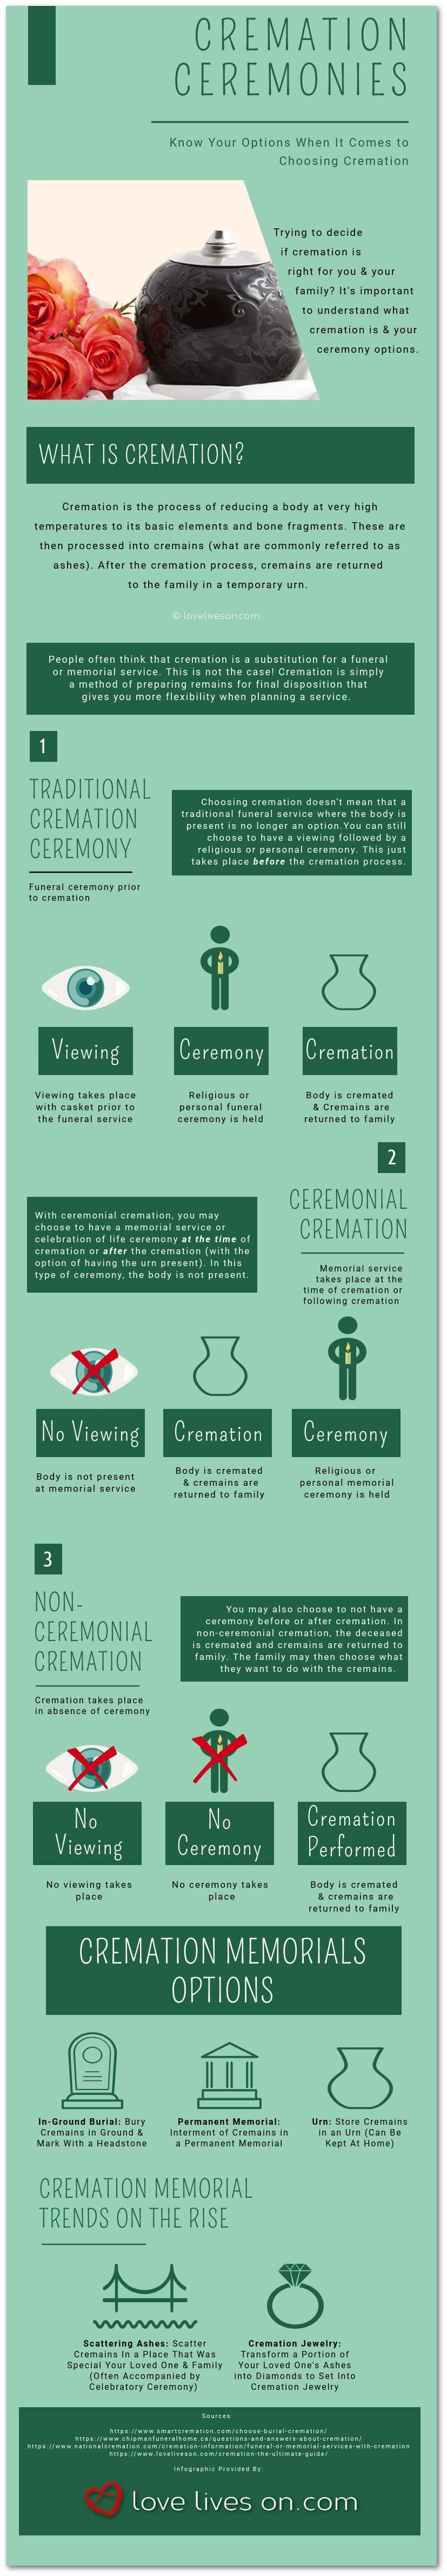 Cremation Ceremonies_[Infographic]